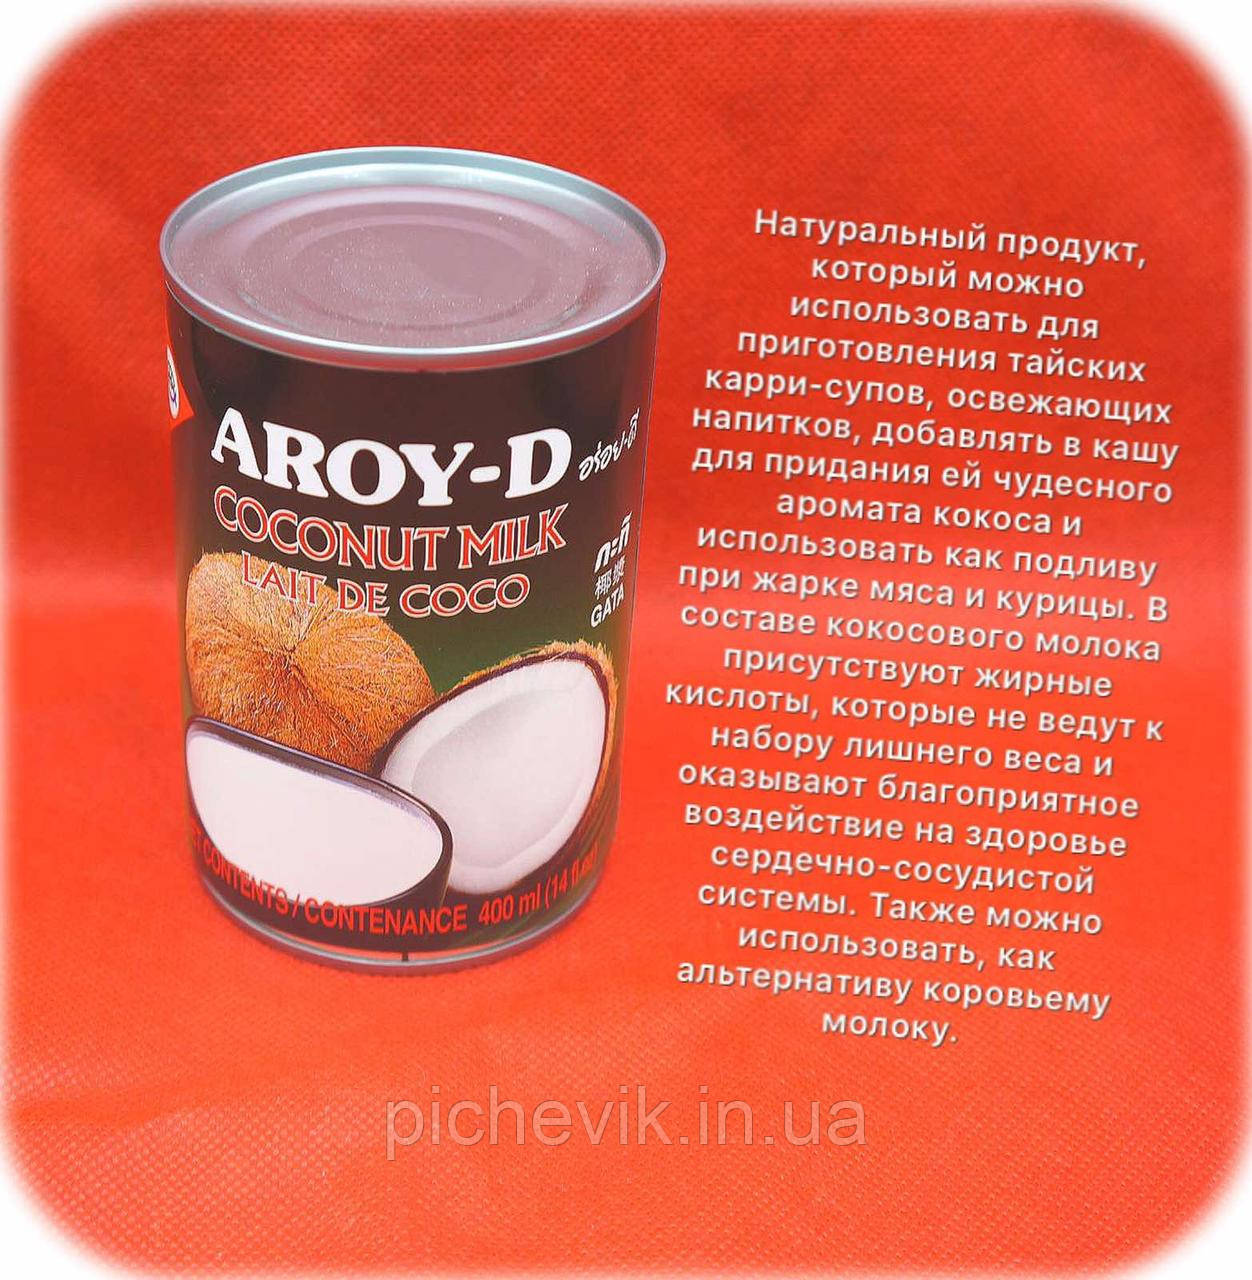 Кокосовое молоко 60% ТМ Aroy-D (Таиланд) Объем:400 мл